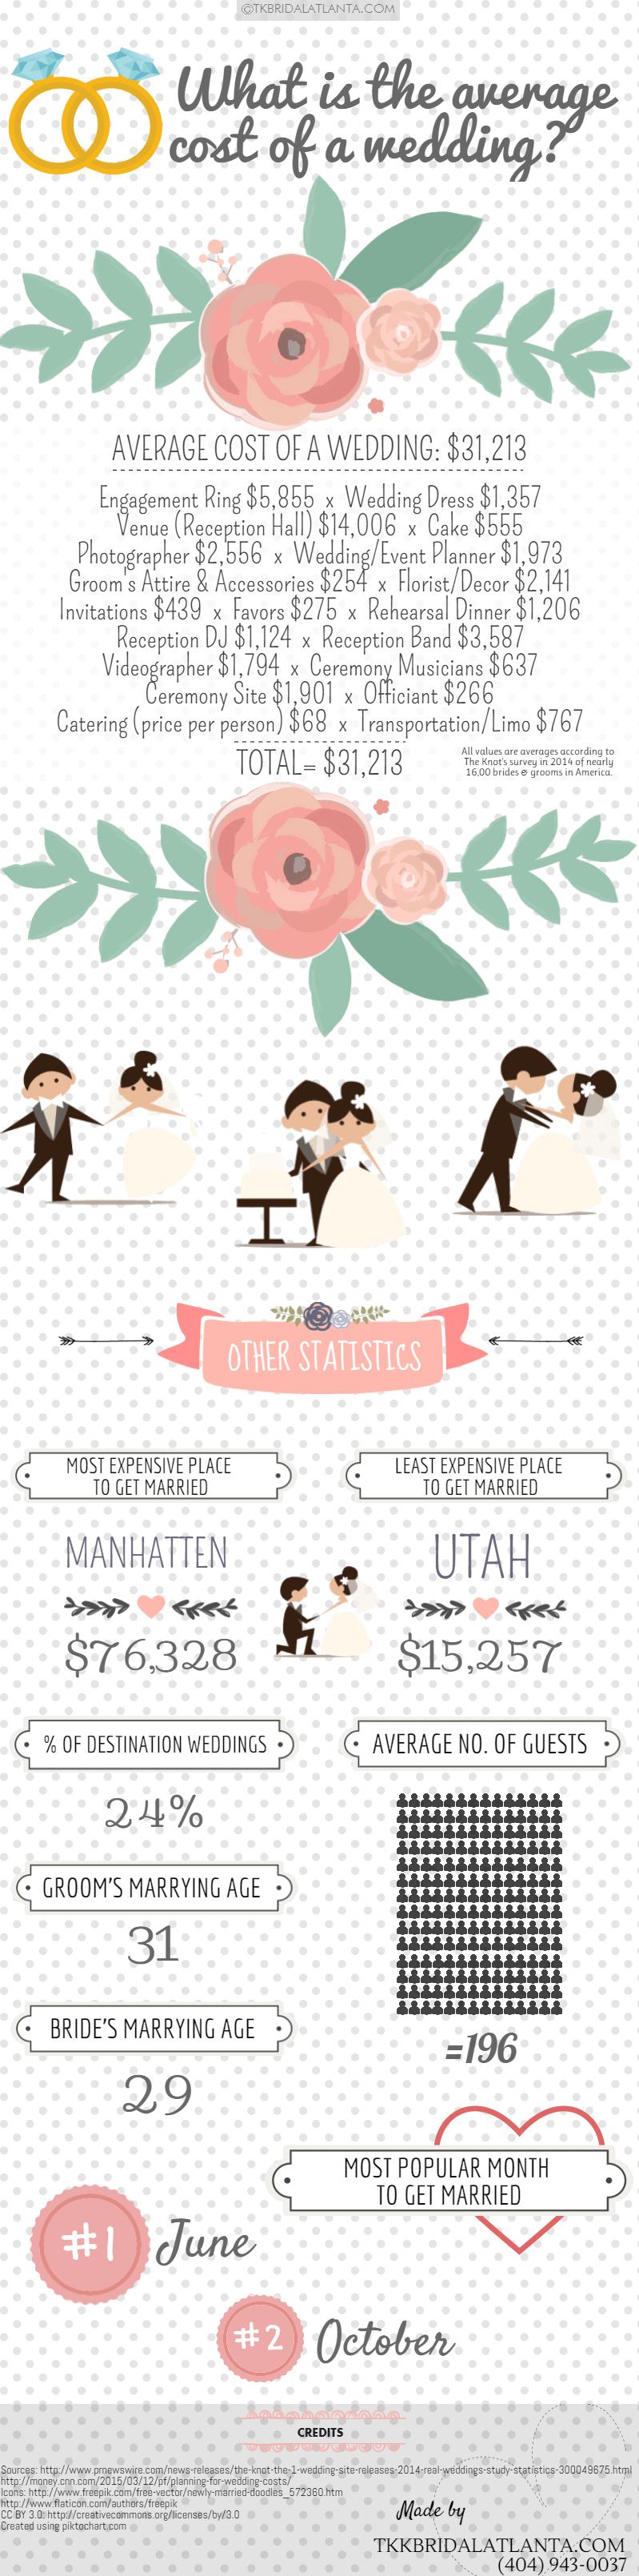 The Average Cost of a Wedding in the US: http://www.tkbridalatlanta ...